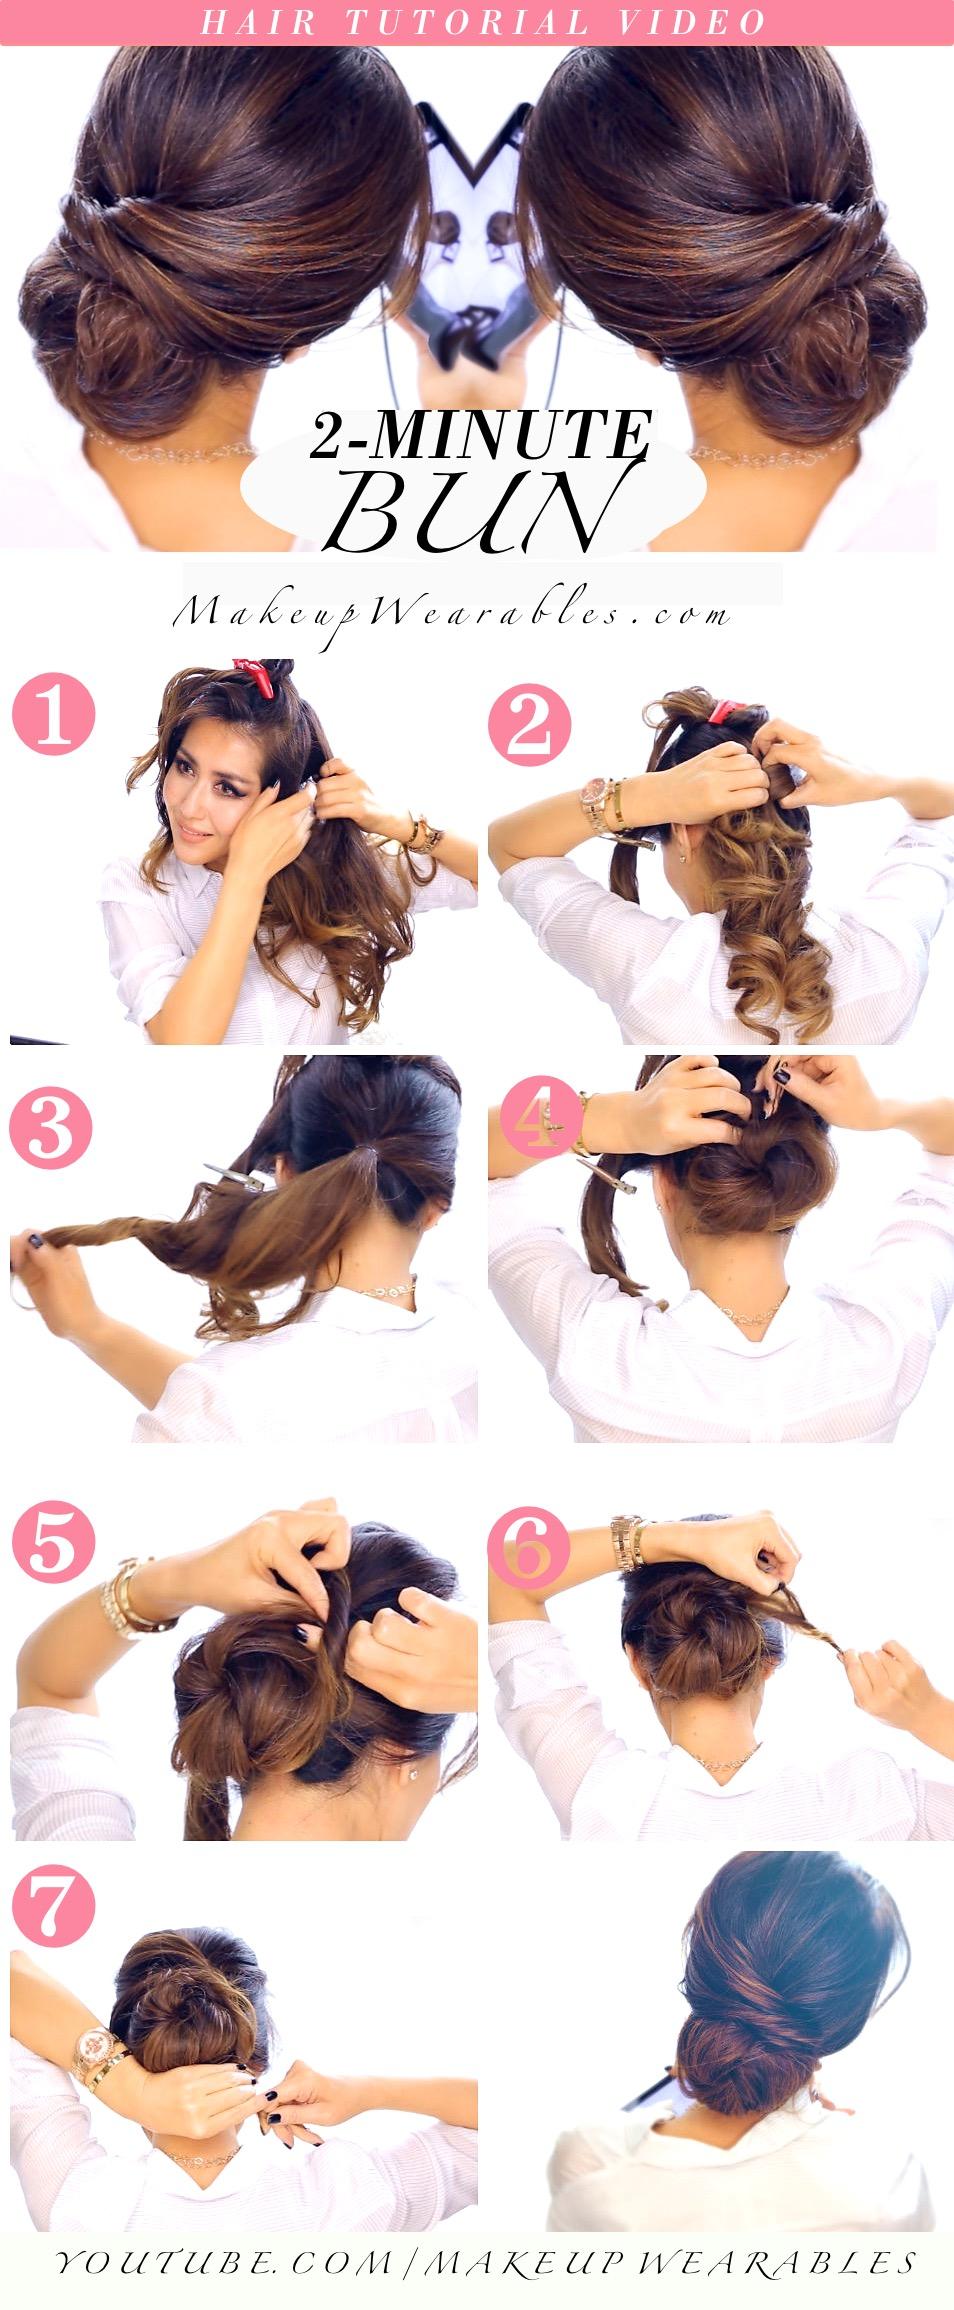 Awe Inspiring Top 25 Messy Hair Bun Tutorials Perfect For Those Lazy Mornings Short Hairstyles Gunalazisus